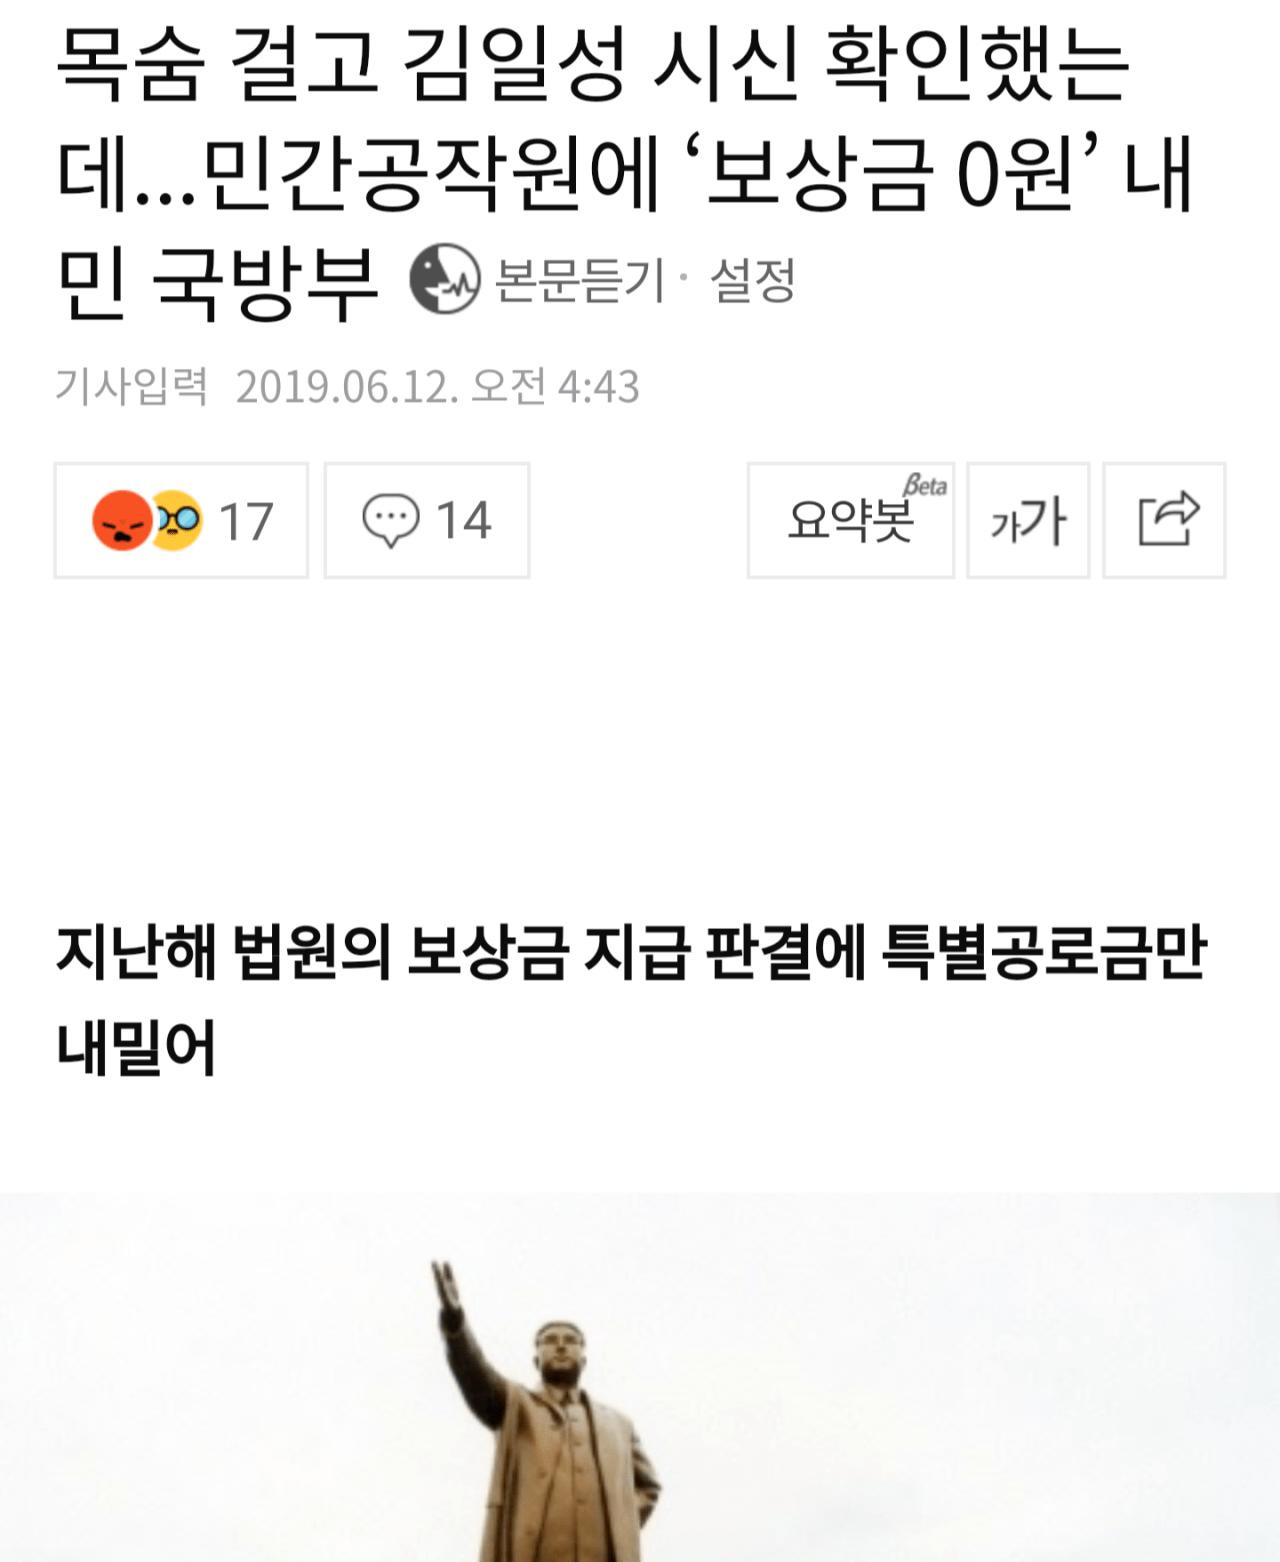 20190612_101451.png 목숨 걸고 국가에 헌신한 북파 공작원과 베트남 파병 군인의 최후.jpg